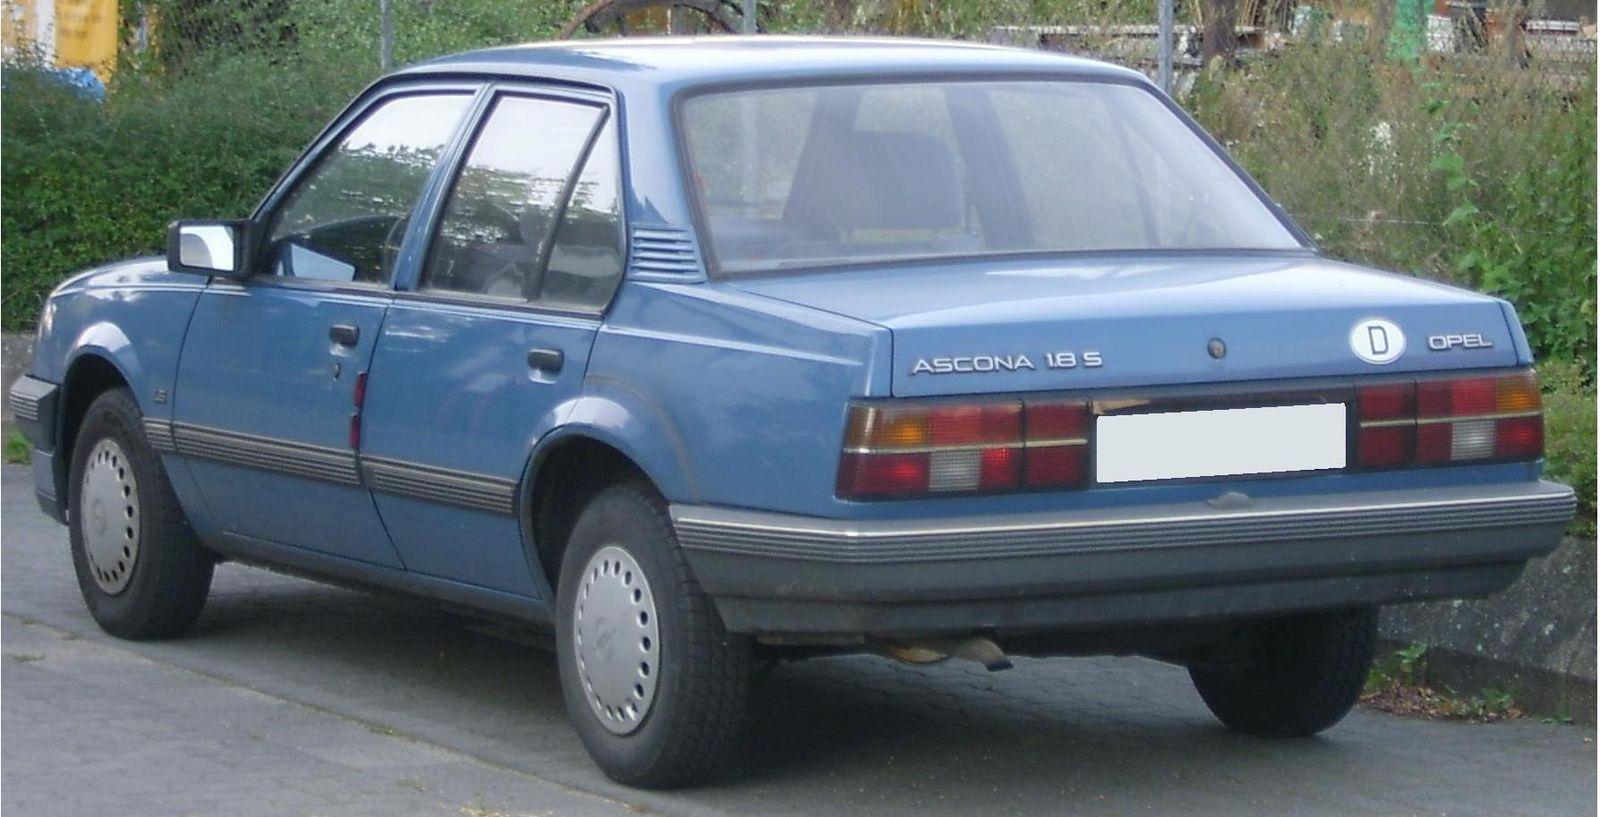 Opel Ascona (foto: Automodeller / wikimedia)